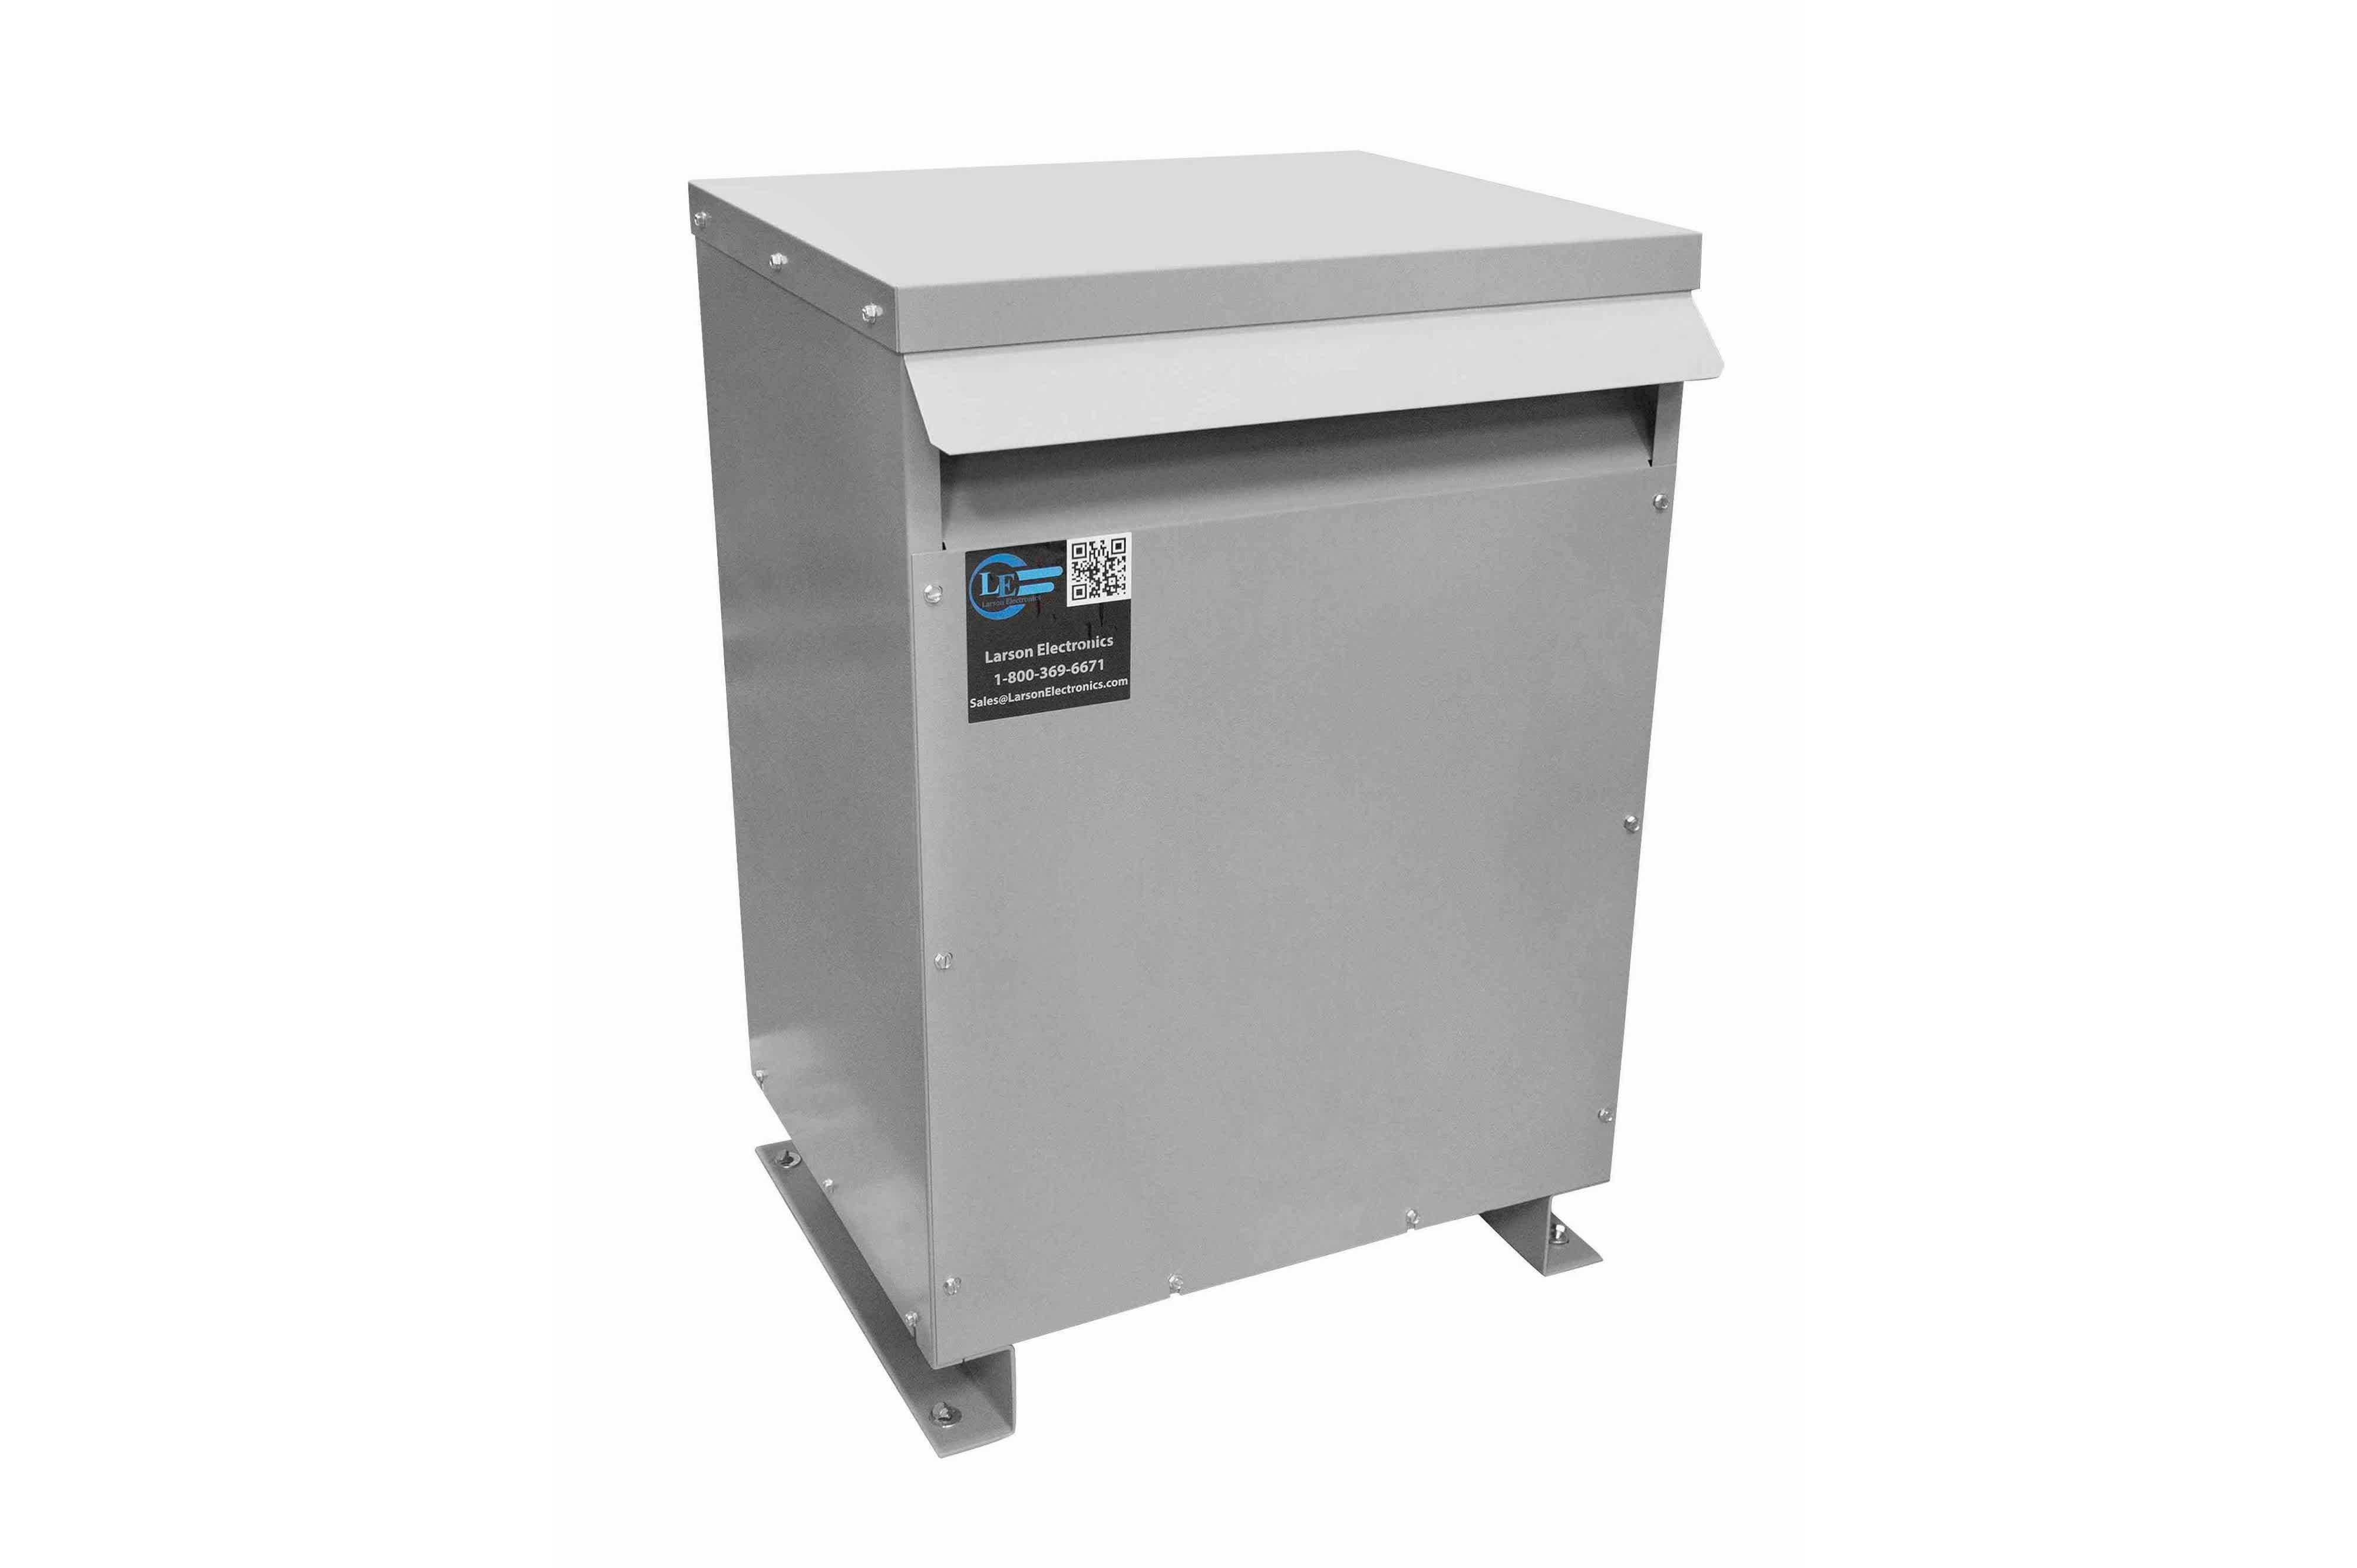 167 kVA 3PH Isolation Transformer, 380V Wye Primary, 480V Delta Secondary, N3R, Ventilated, 60 Hz